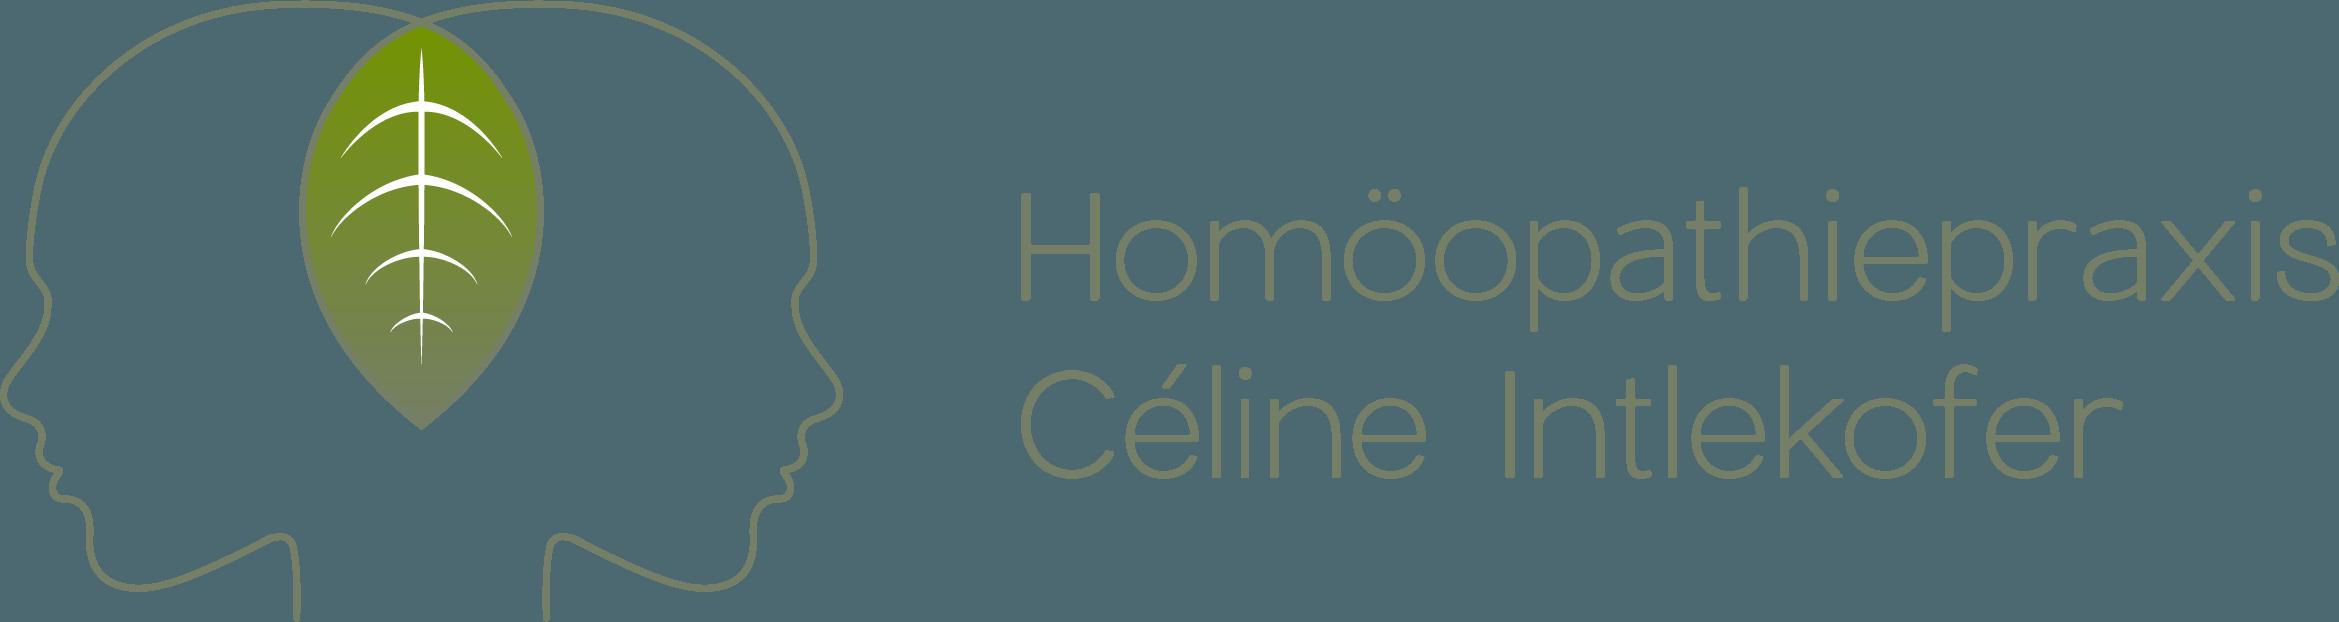 Homöopathie Praxis Céline Intlekofer